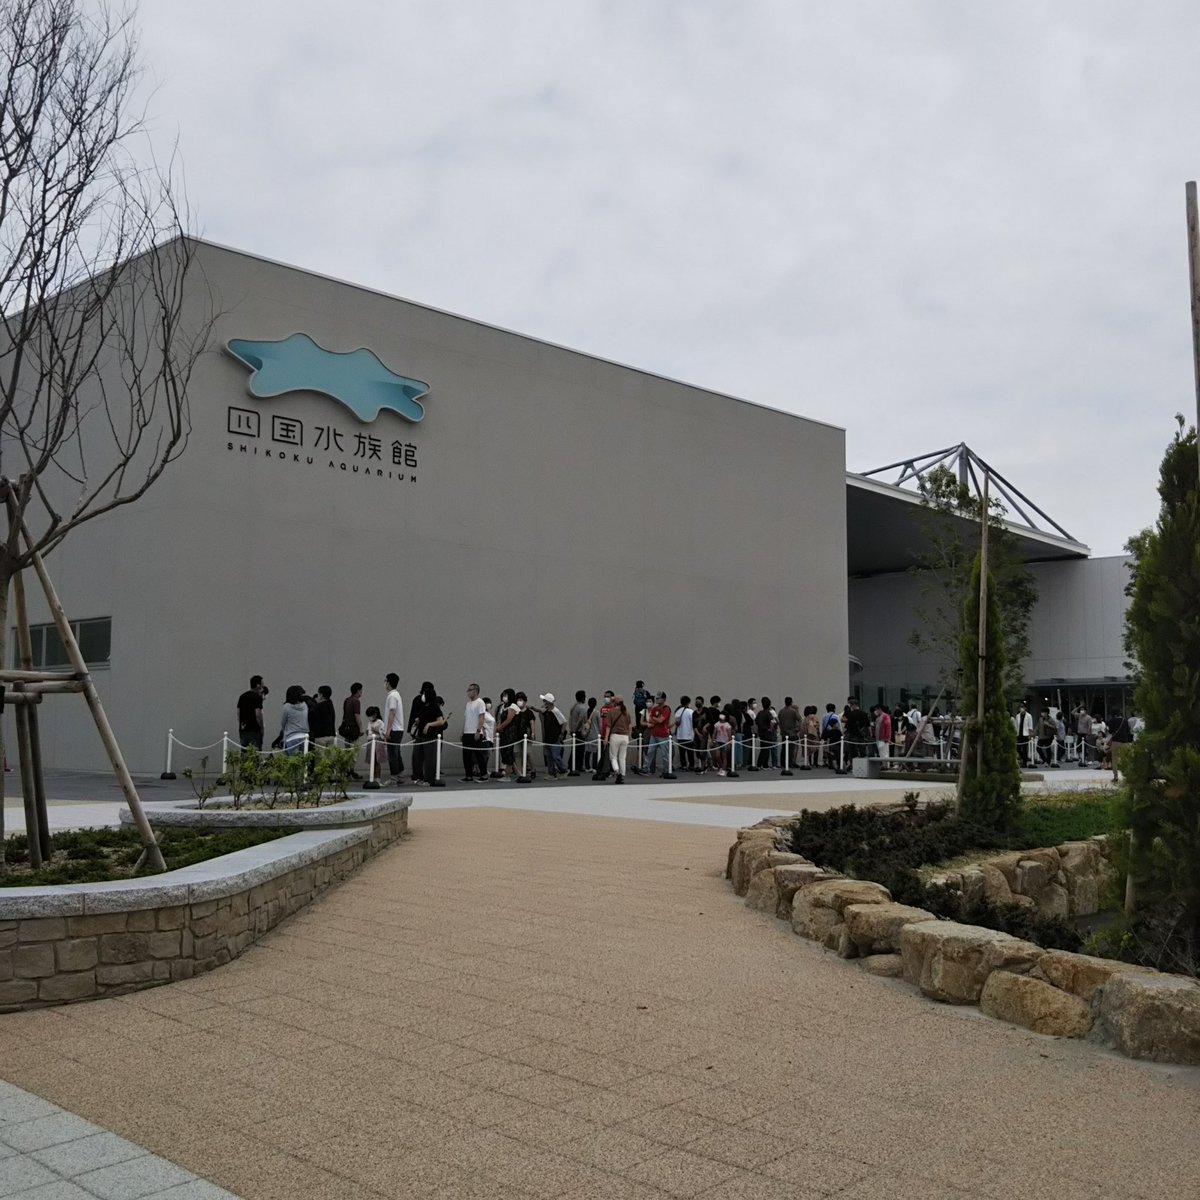 test ツイッターメディア - 1ヶ月前にオープンした四国水族館に来てみました。(ゴールドタワー北) あつ森のおかげで息子が興味津々。 アカシュモクザメ見てくるぞい。 この時間だとチケット購入15分待ち。 https://t.co/W8RMXIhFLG